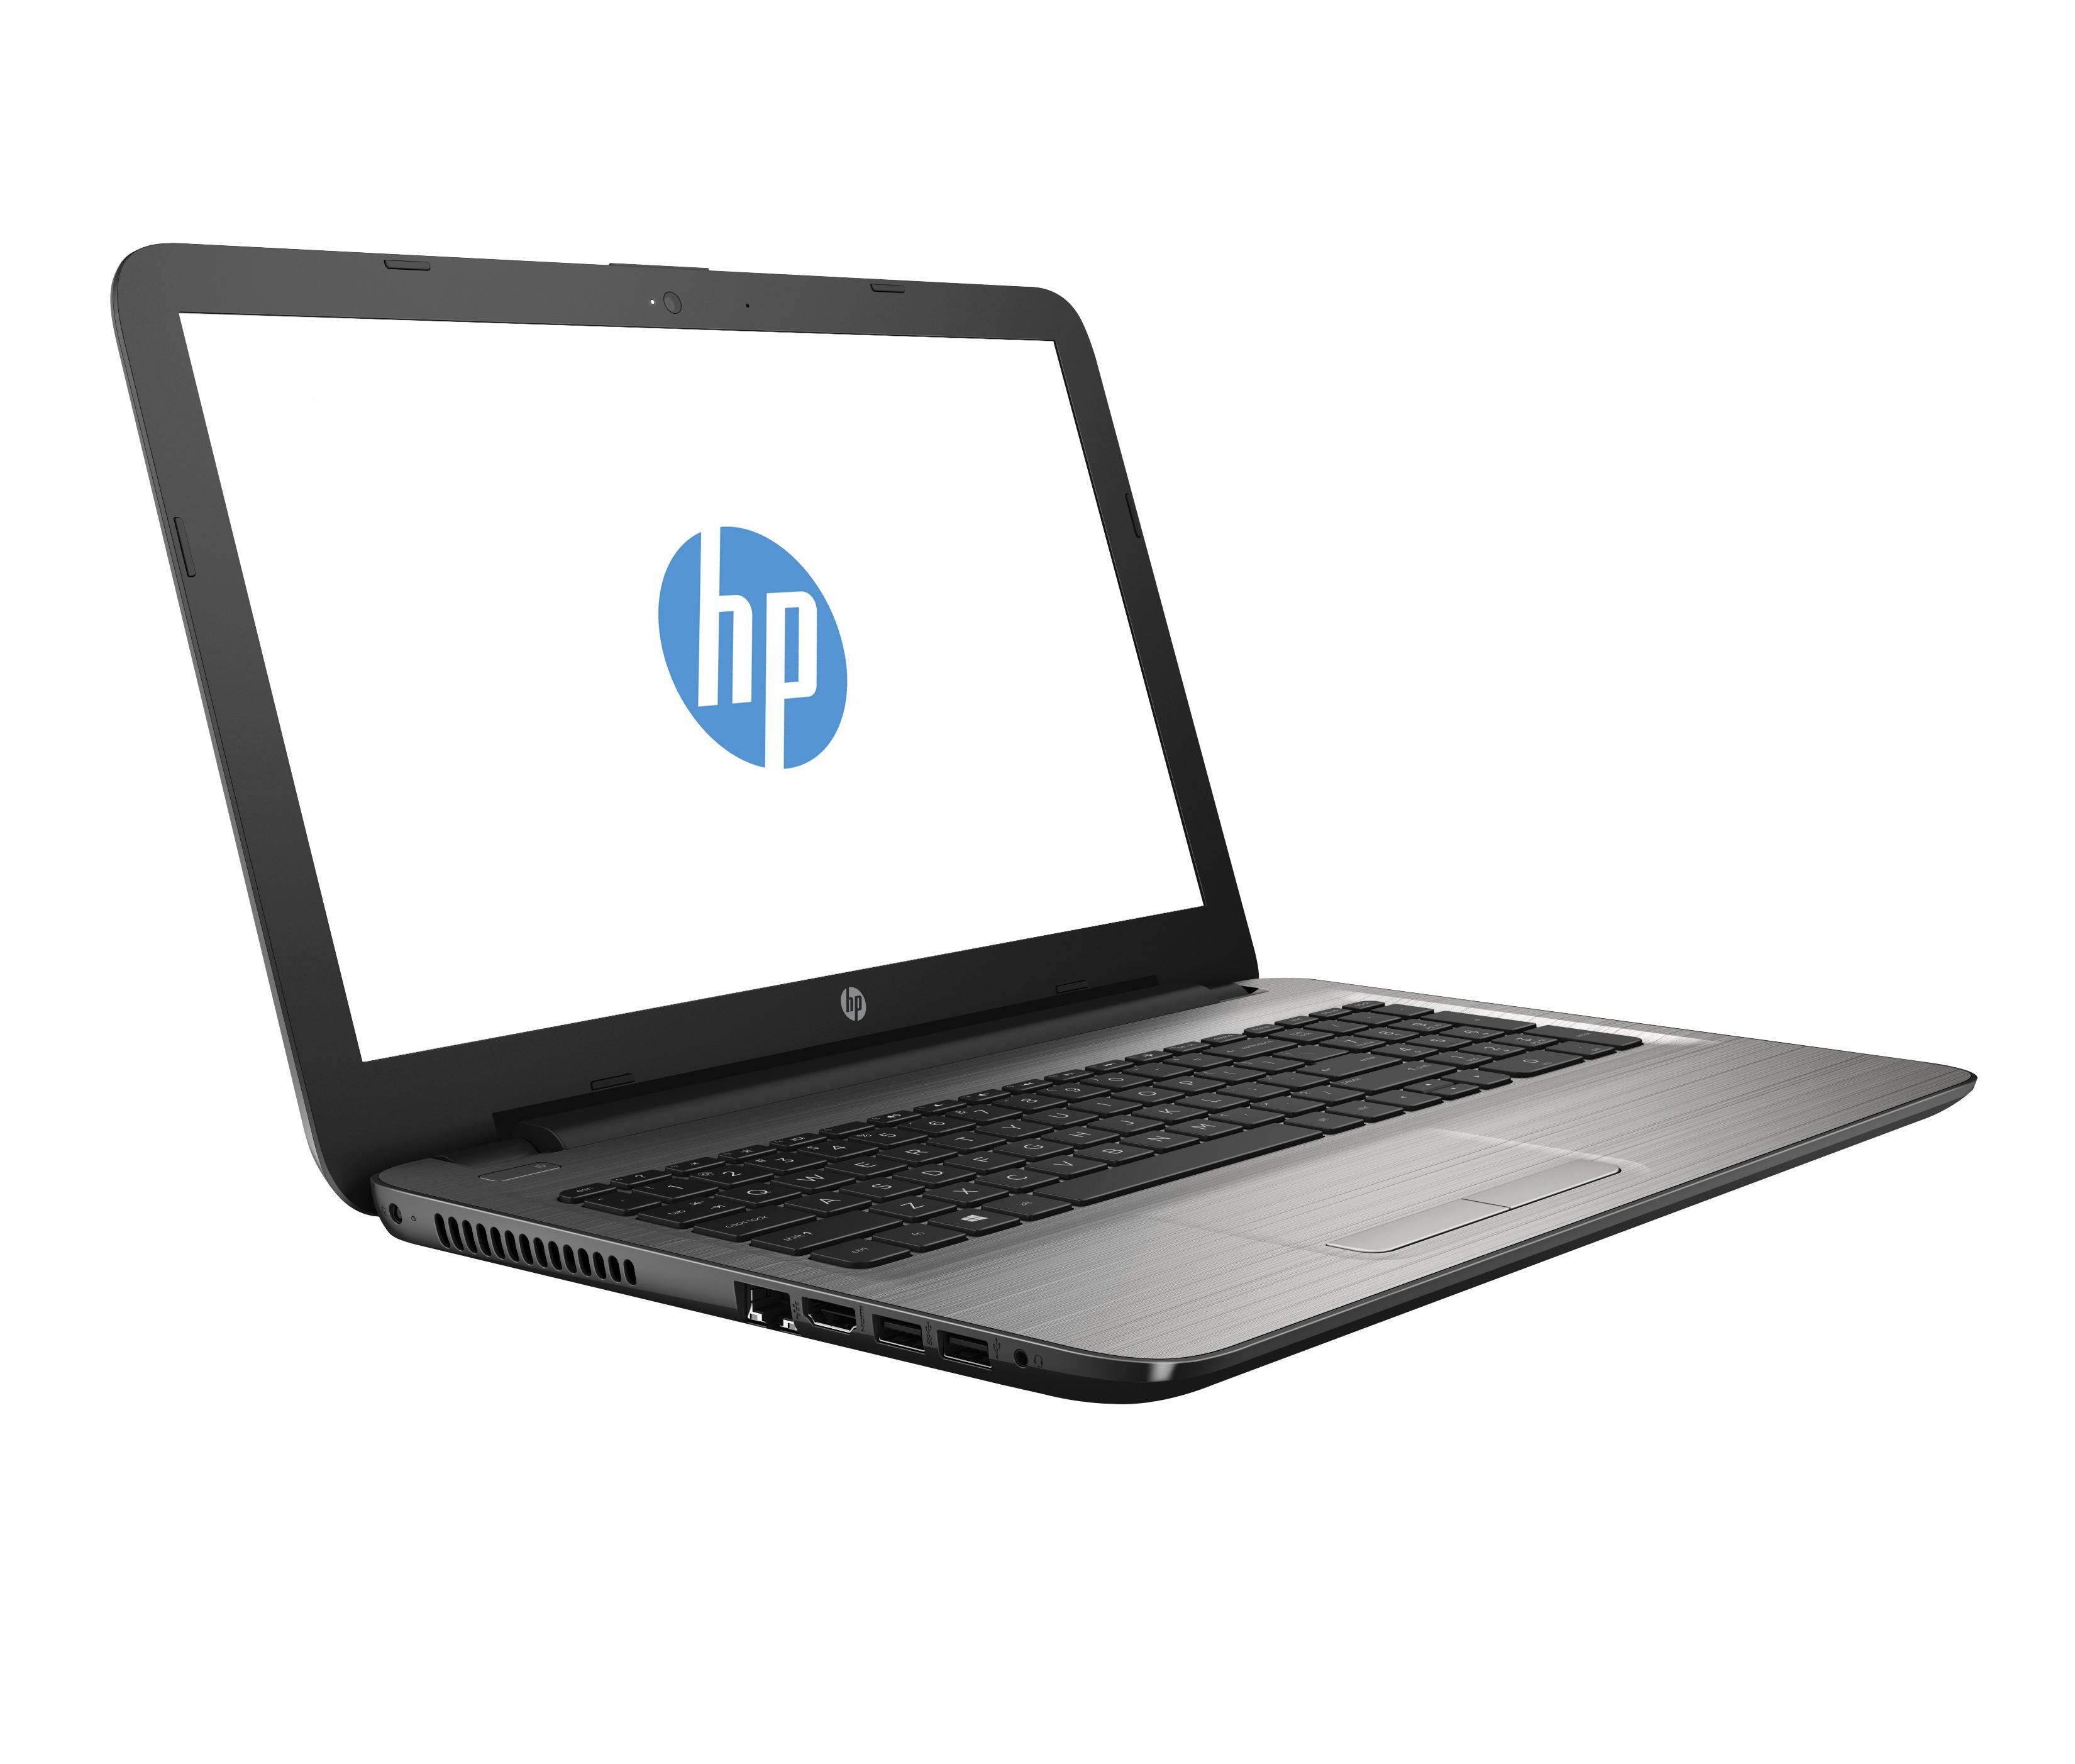 "HP 15-ay188tx 2.70GHz i7-7500U 15.6"" 1366 x 768Pixel Grigio, Argento Computer portatile"